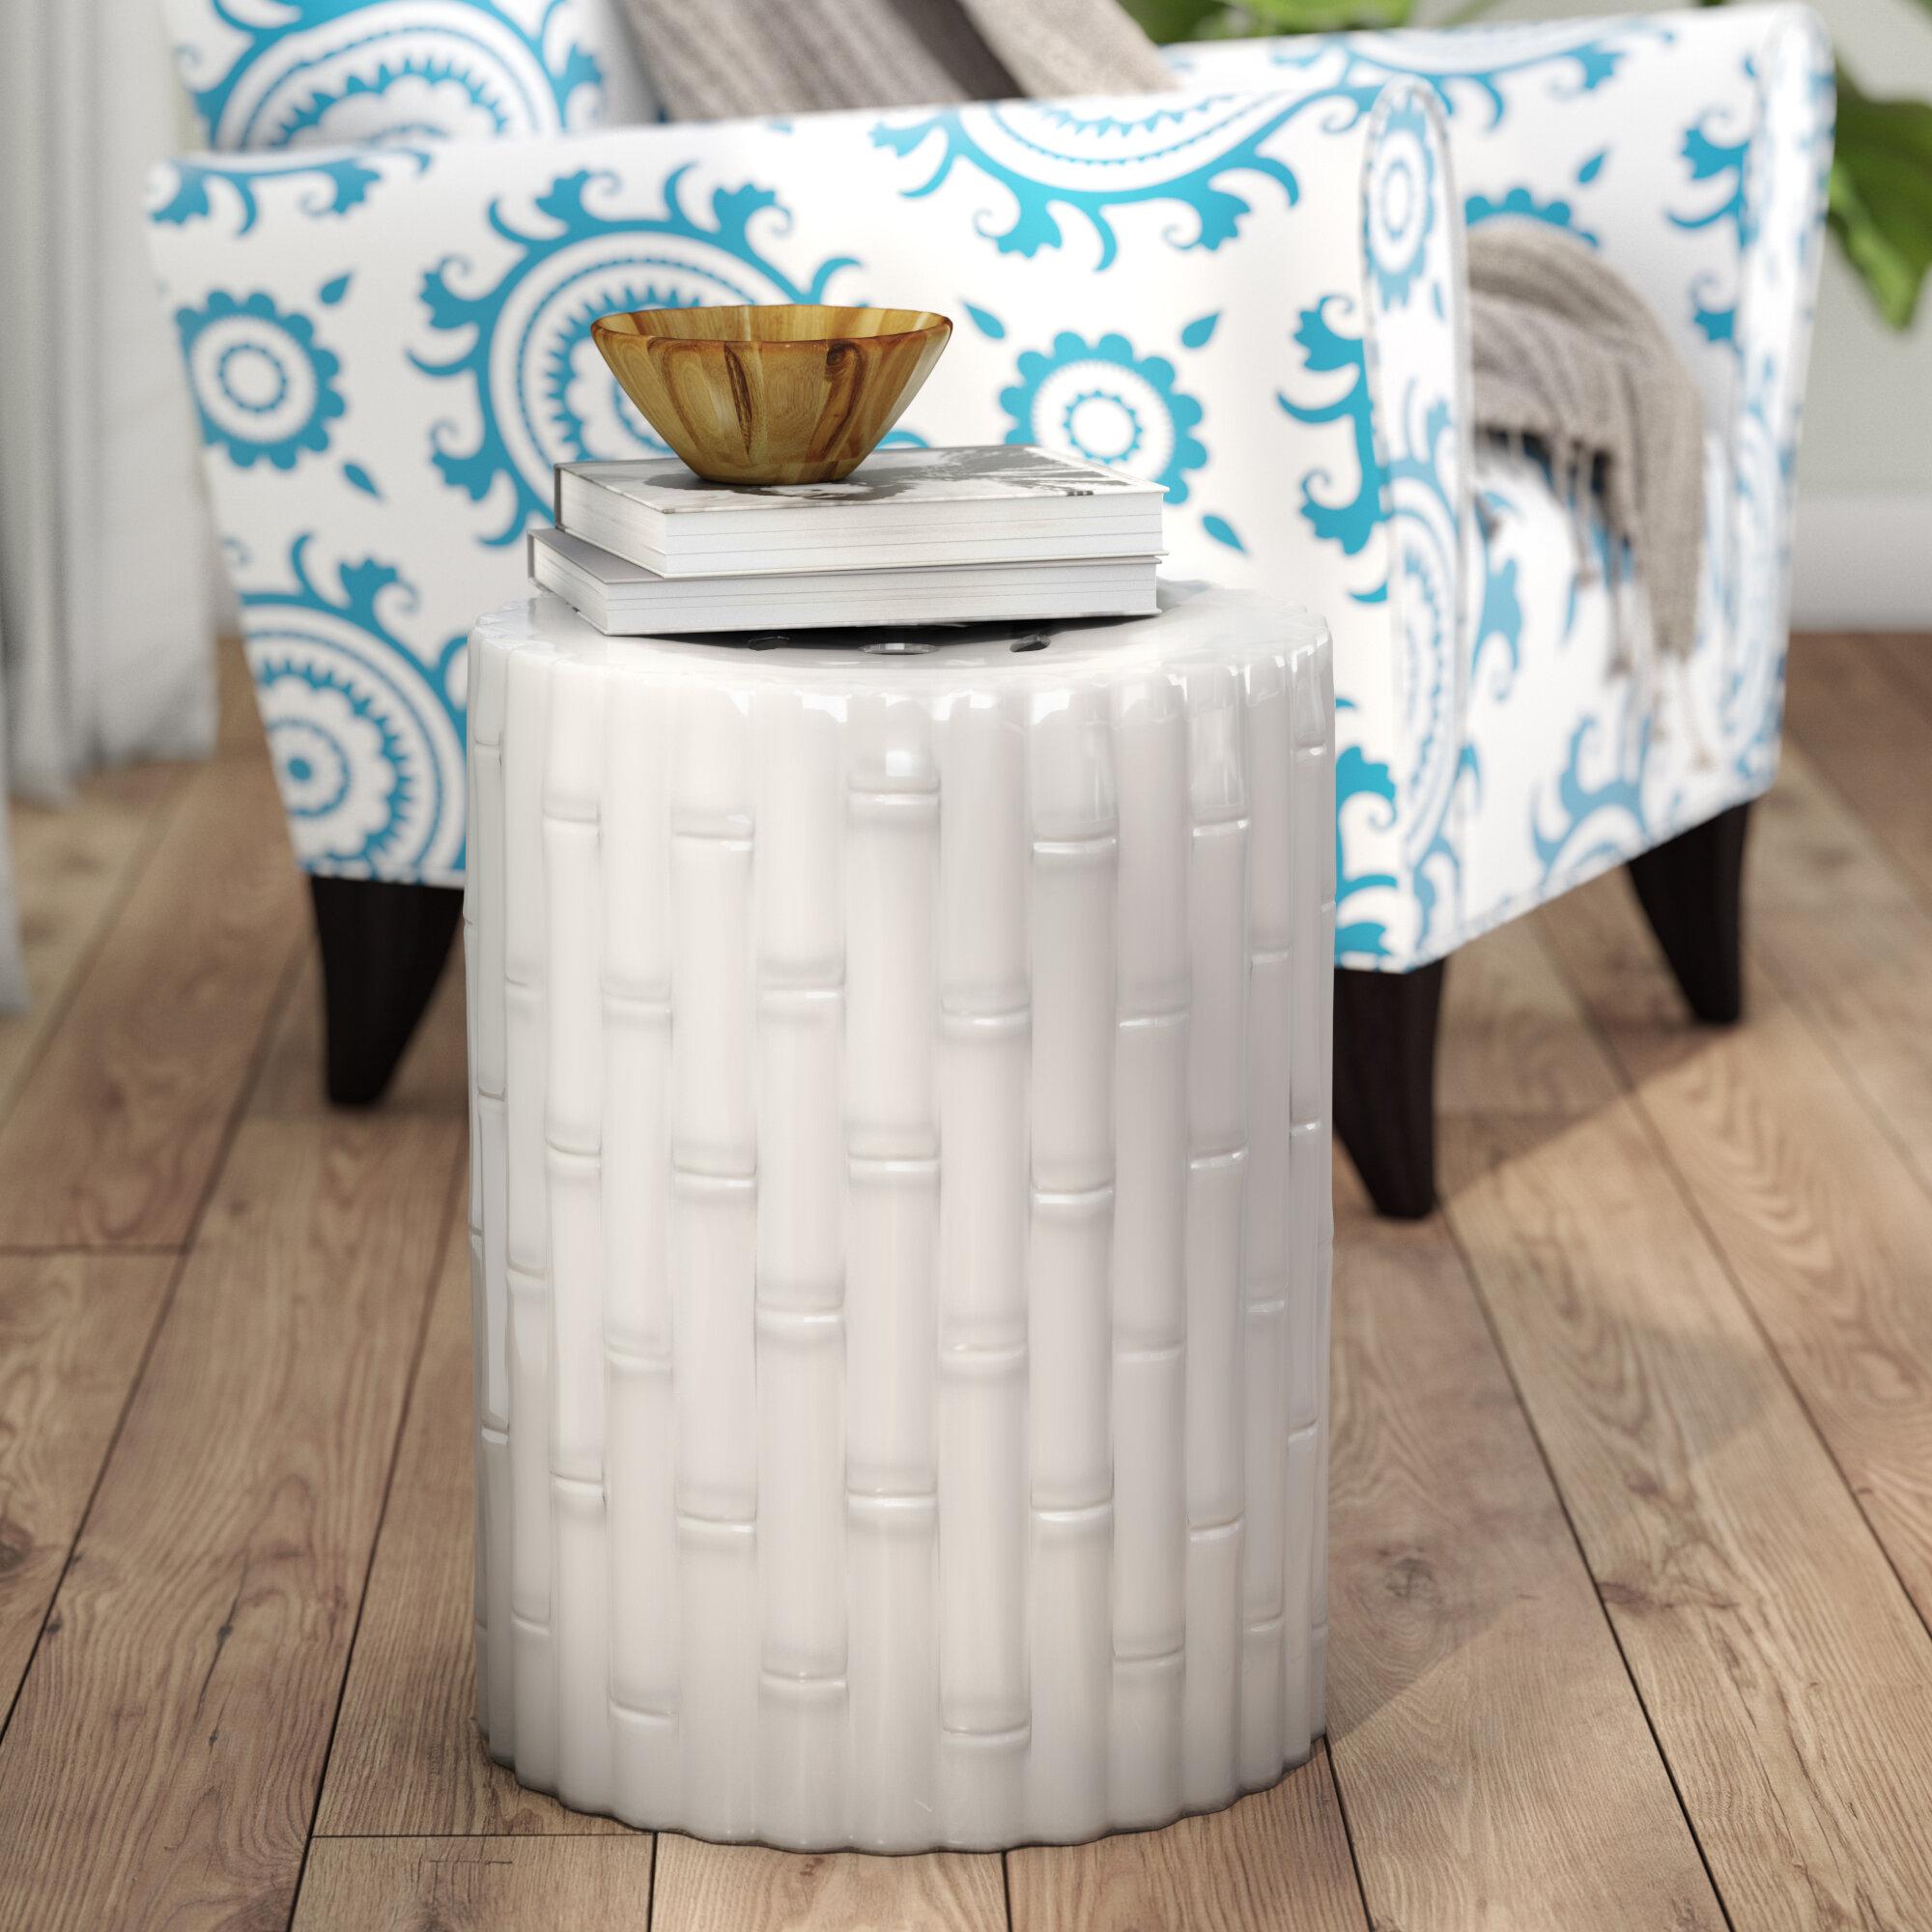 Ceramic Garden Accent Stools You'Ll Love In 2020 | Wayfair Within Engelhardt Ceramic Garden Stools (View 12 of 25)